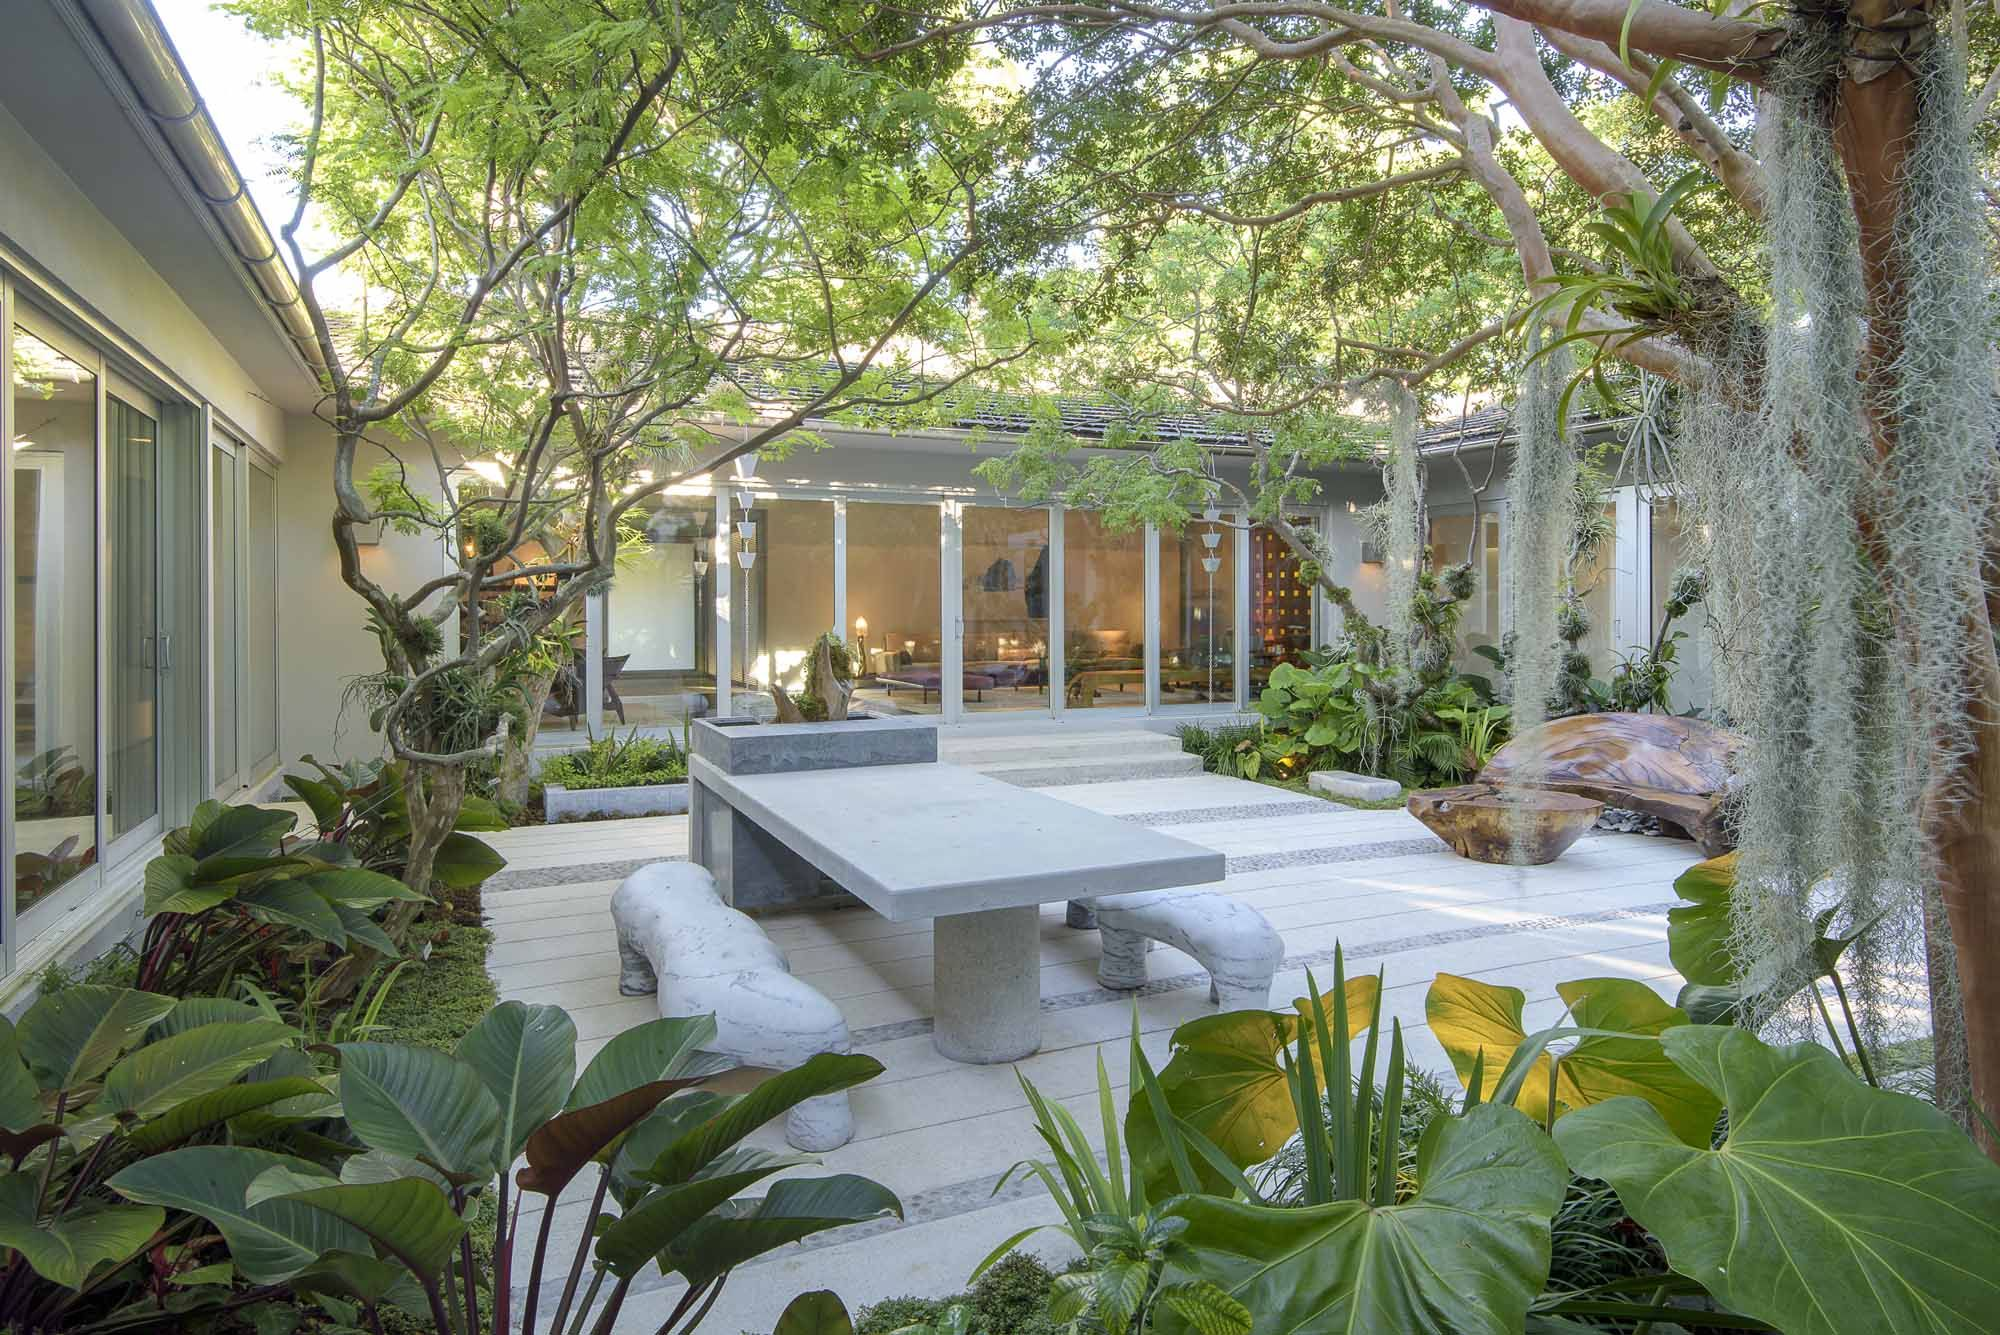 raymond jungles / residential garden, miami beach | Landscape ...